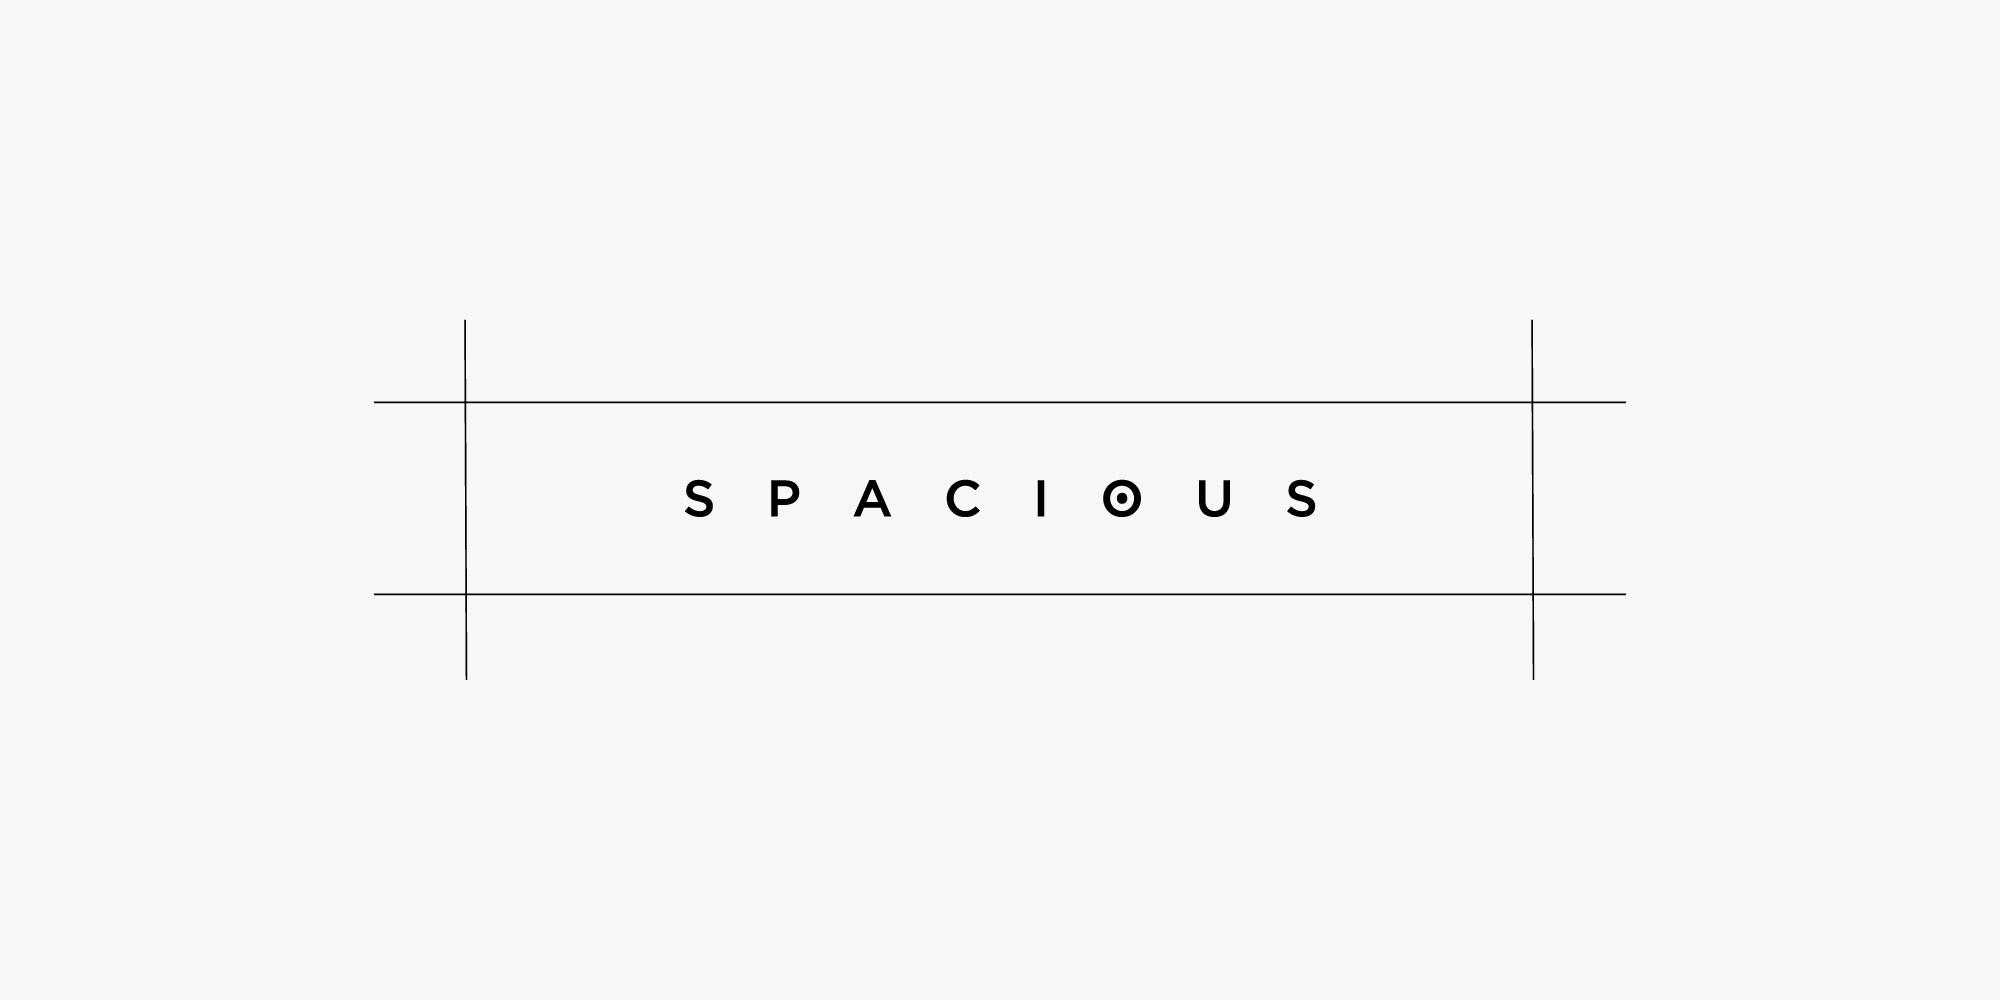 spacious.jpg